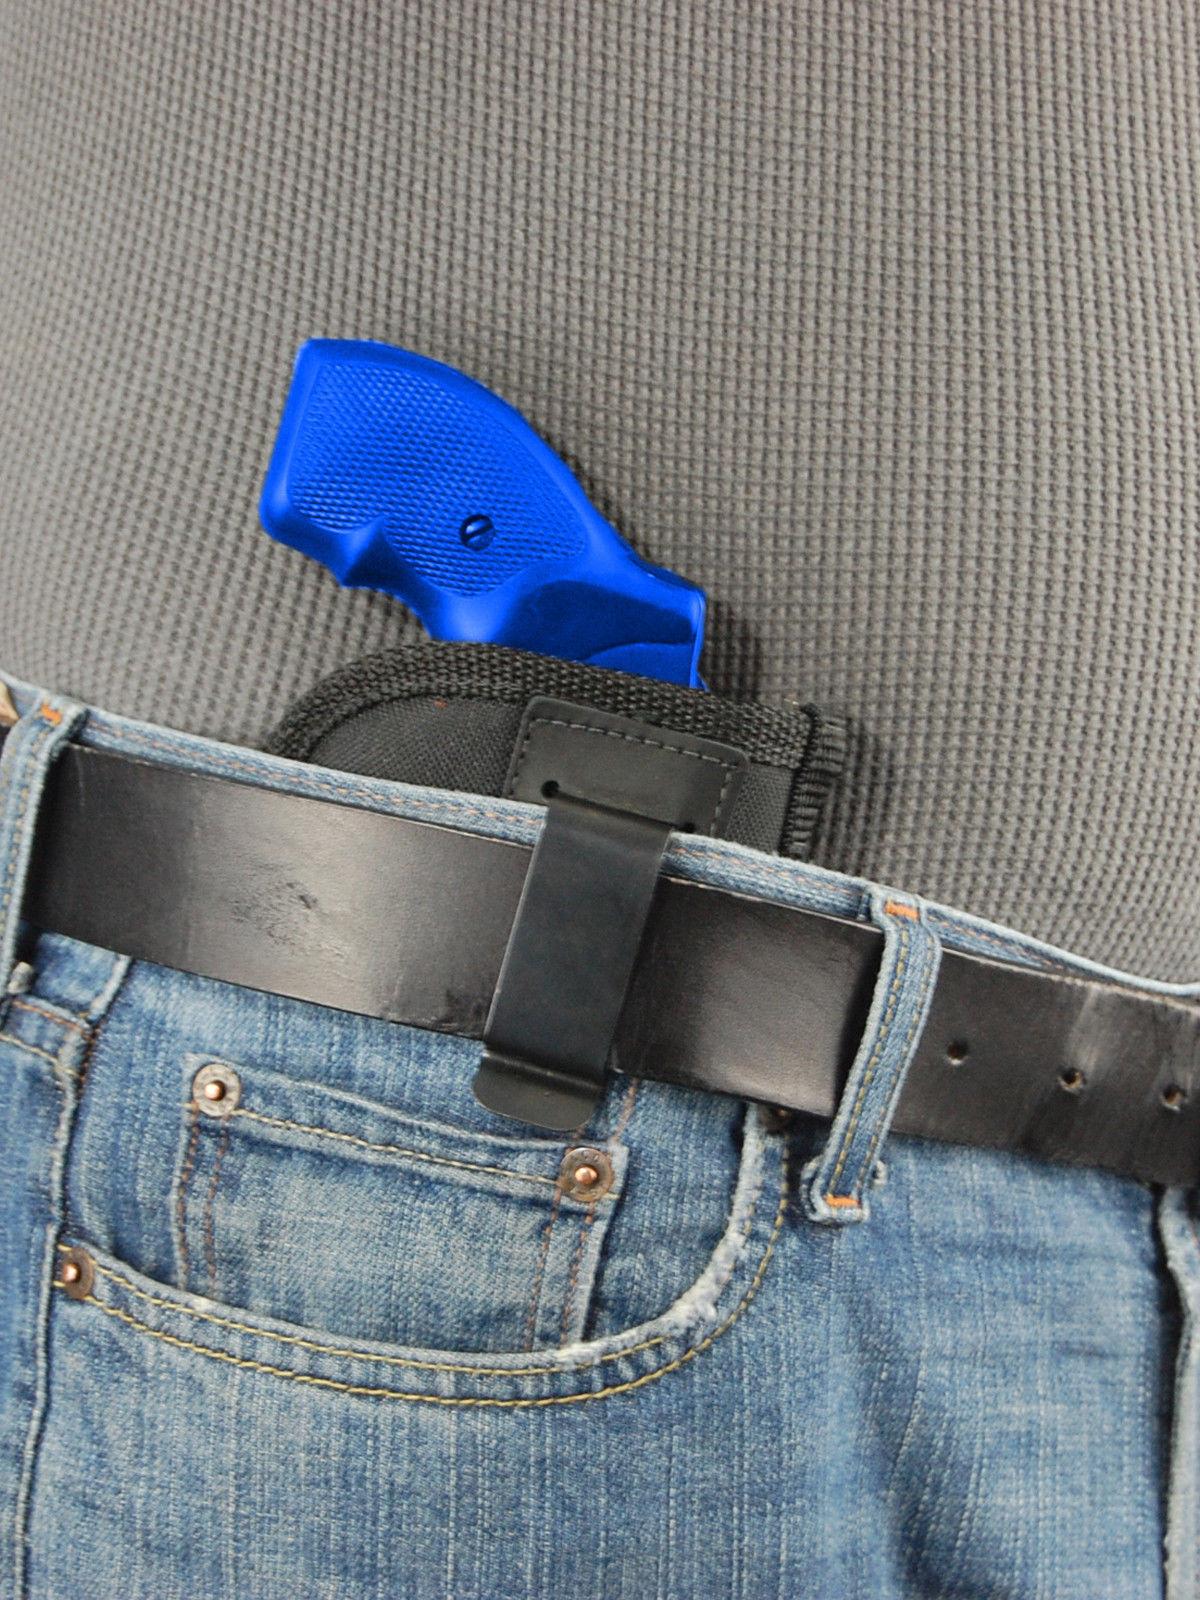 "Barsony IWB Gun Concealment Holster for S&W 2"" Snub Nose Revolver"